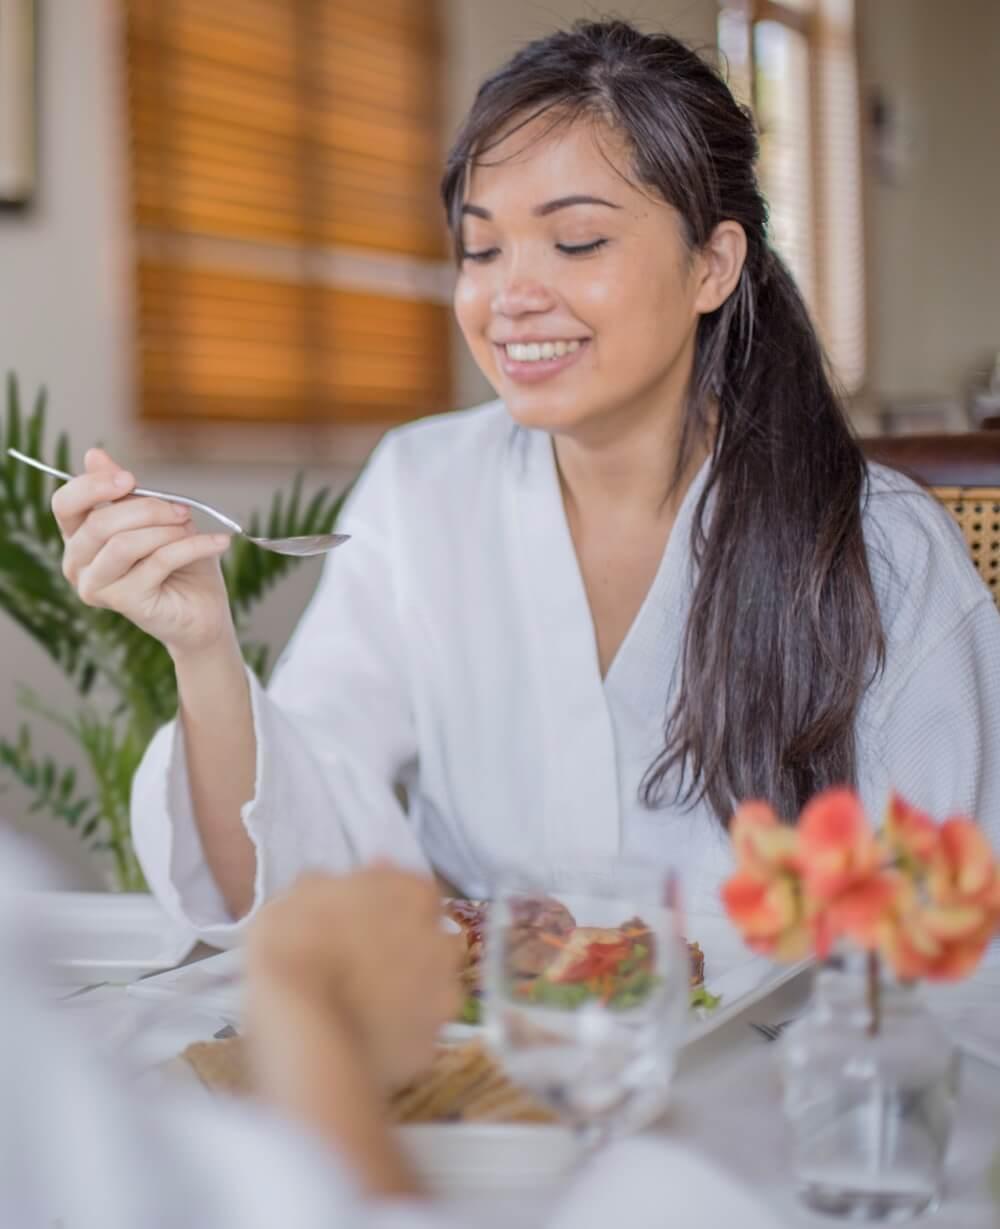 Woman eating diet - Les Mariannes